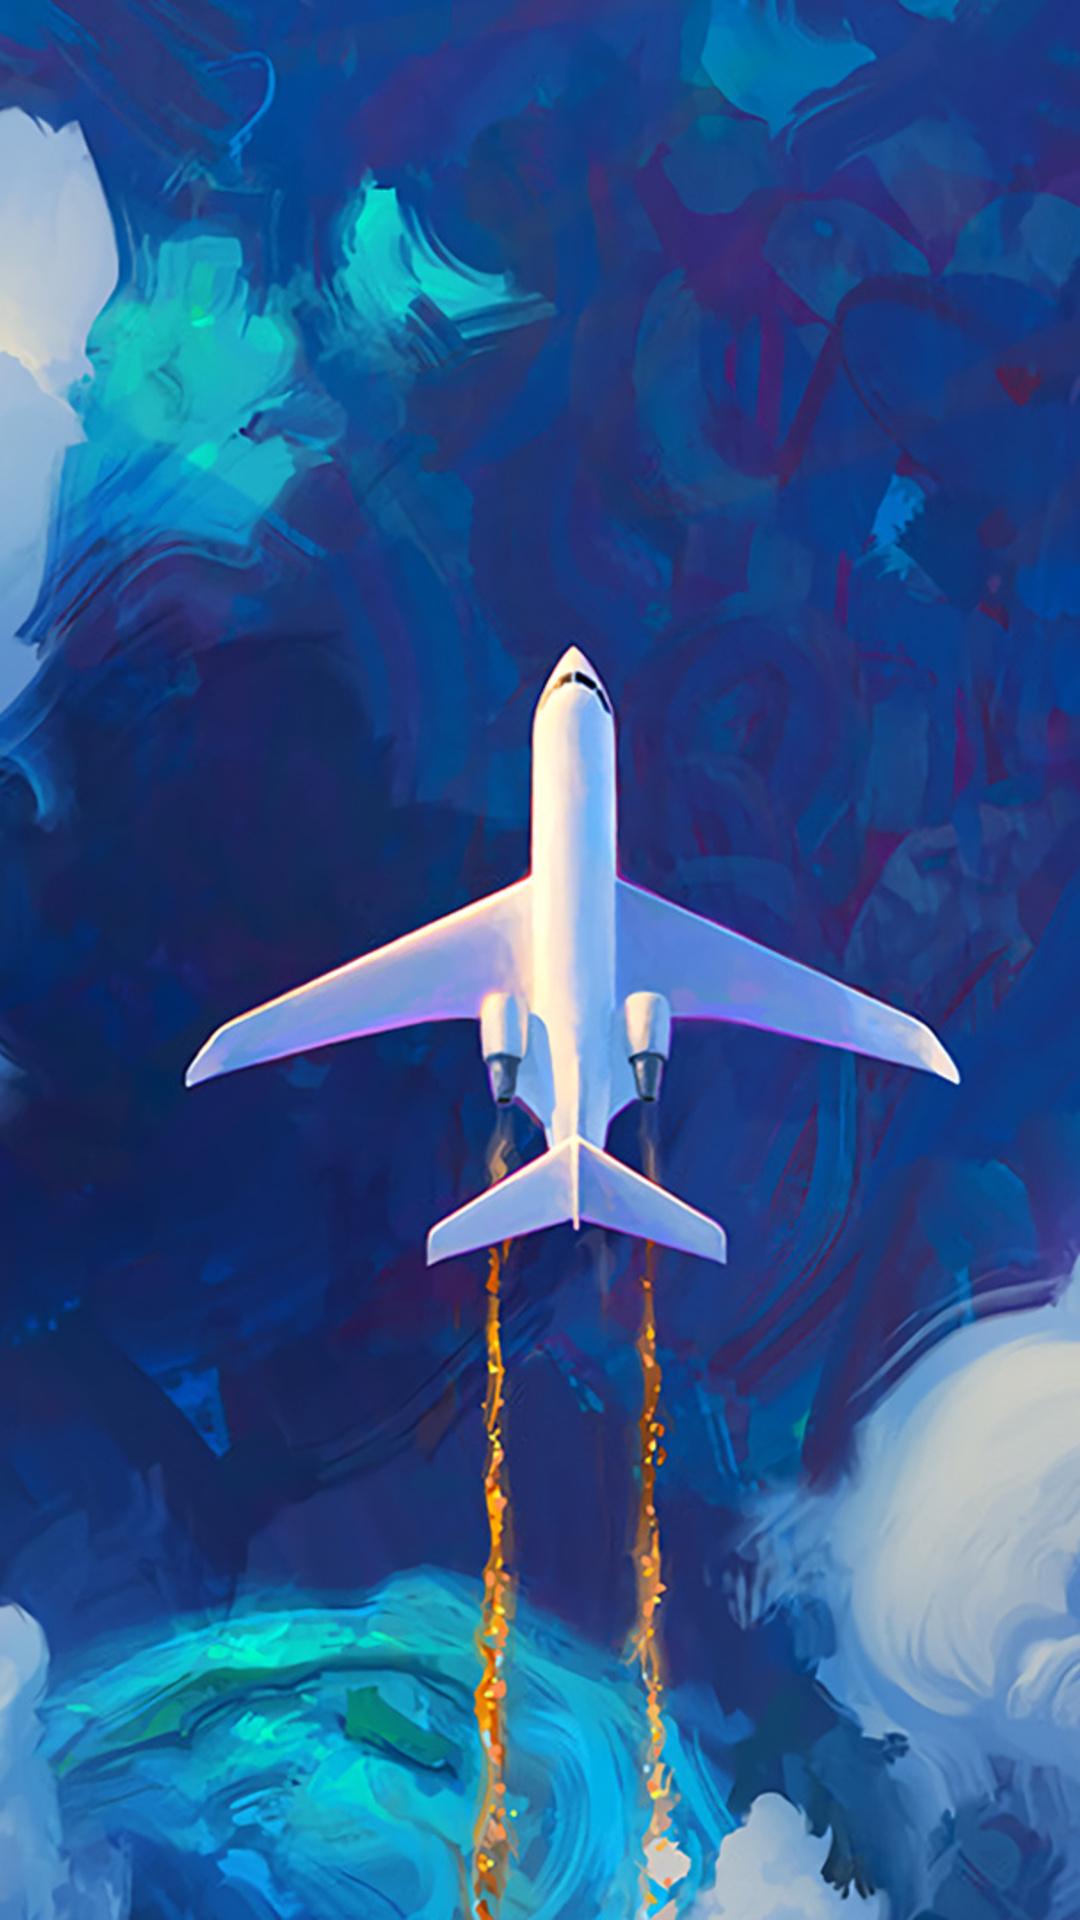 Flying Plane In Clouds Artwork Ux